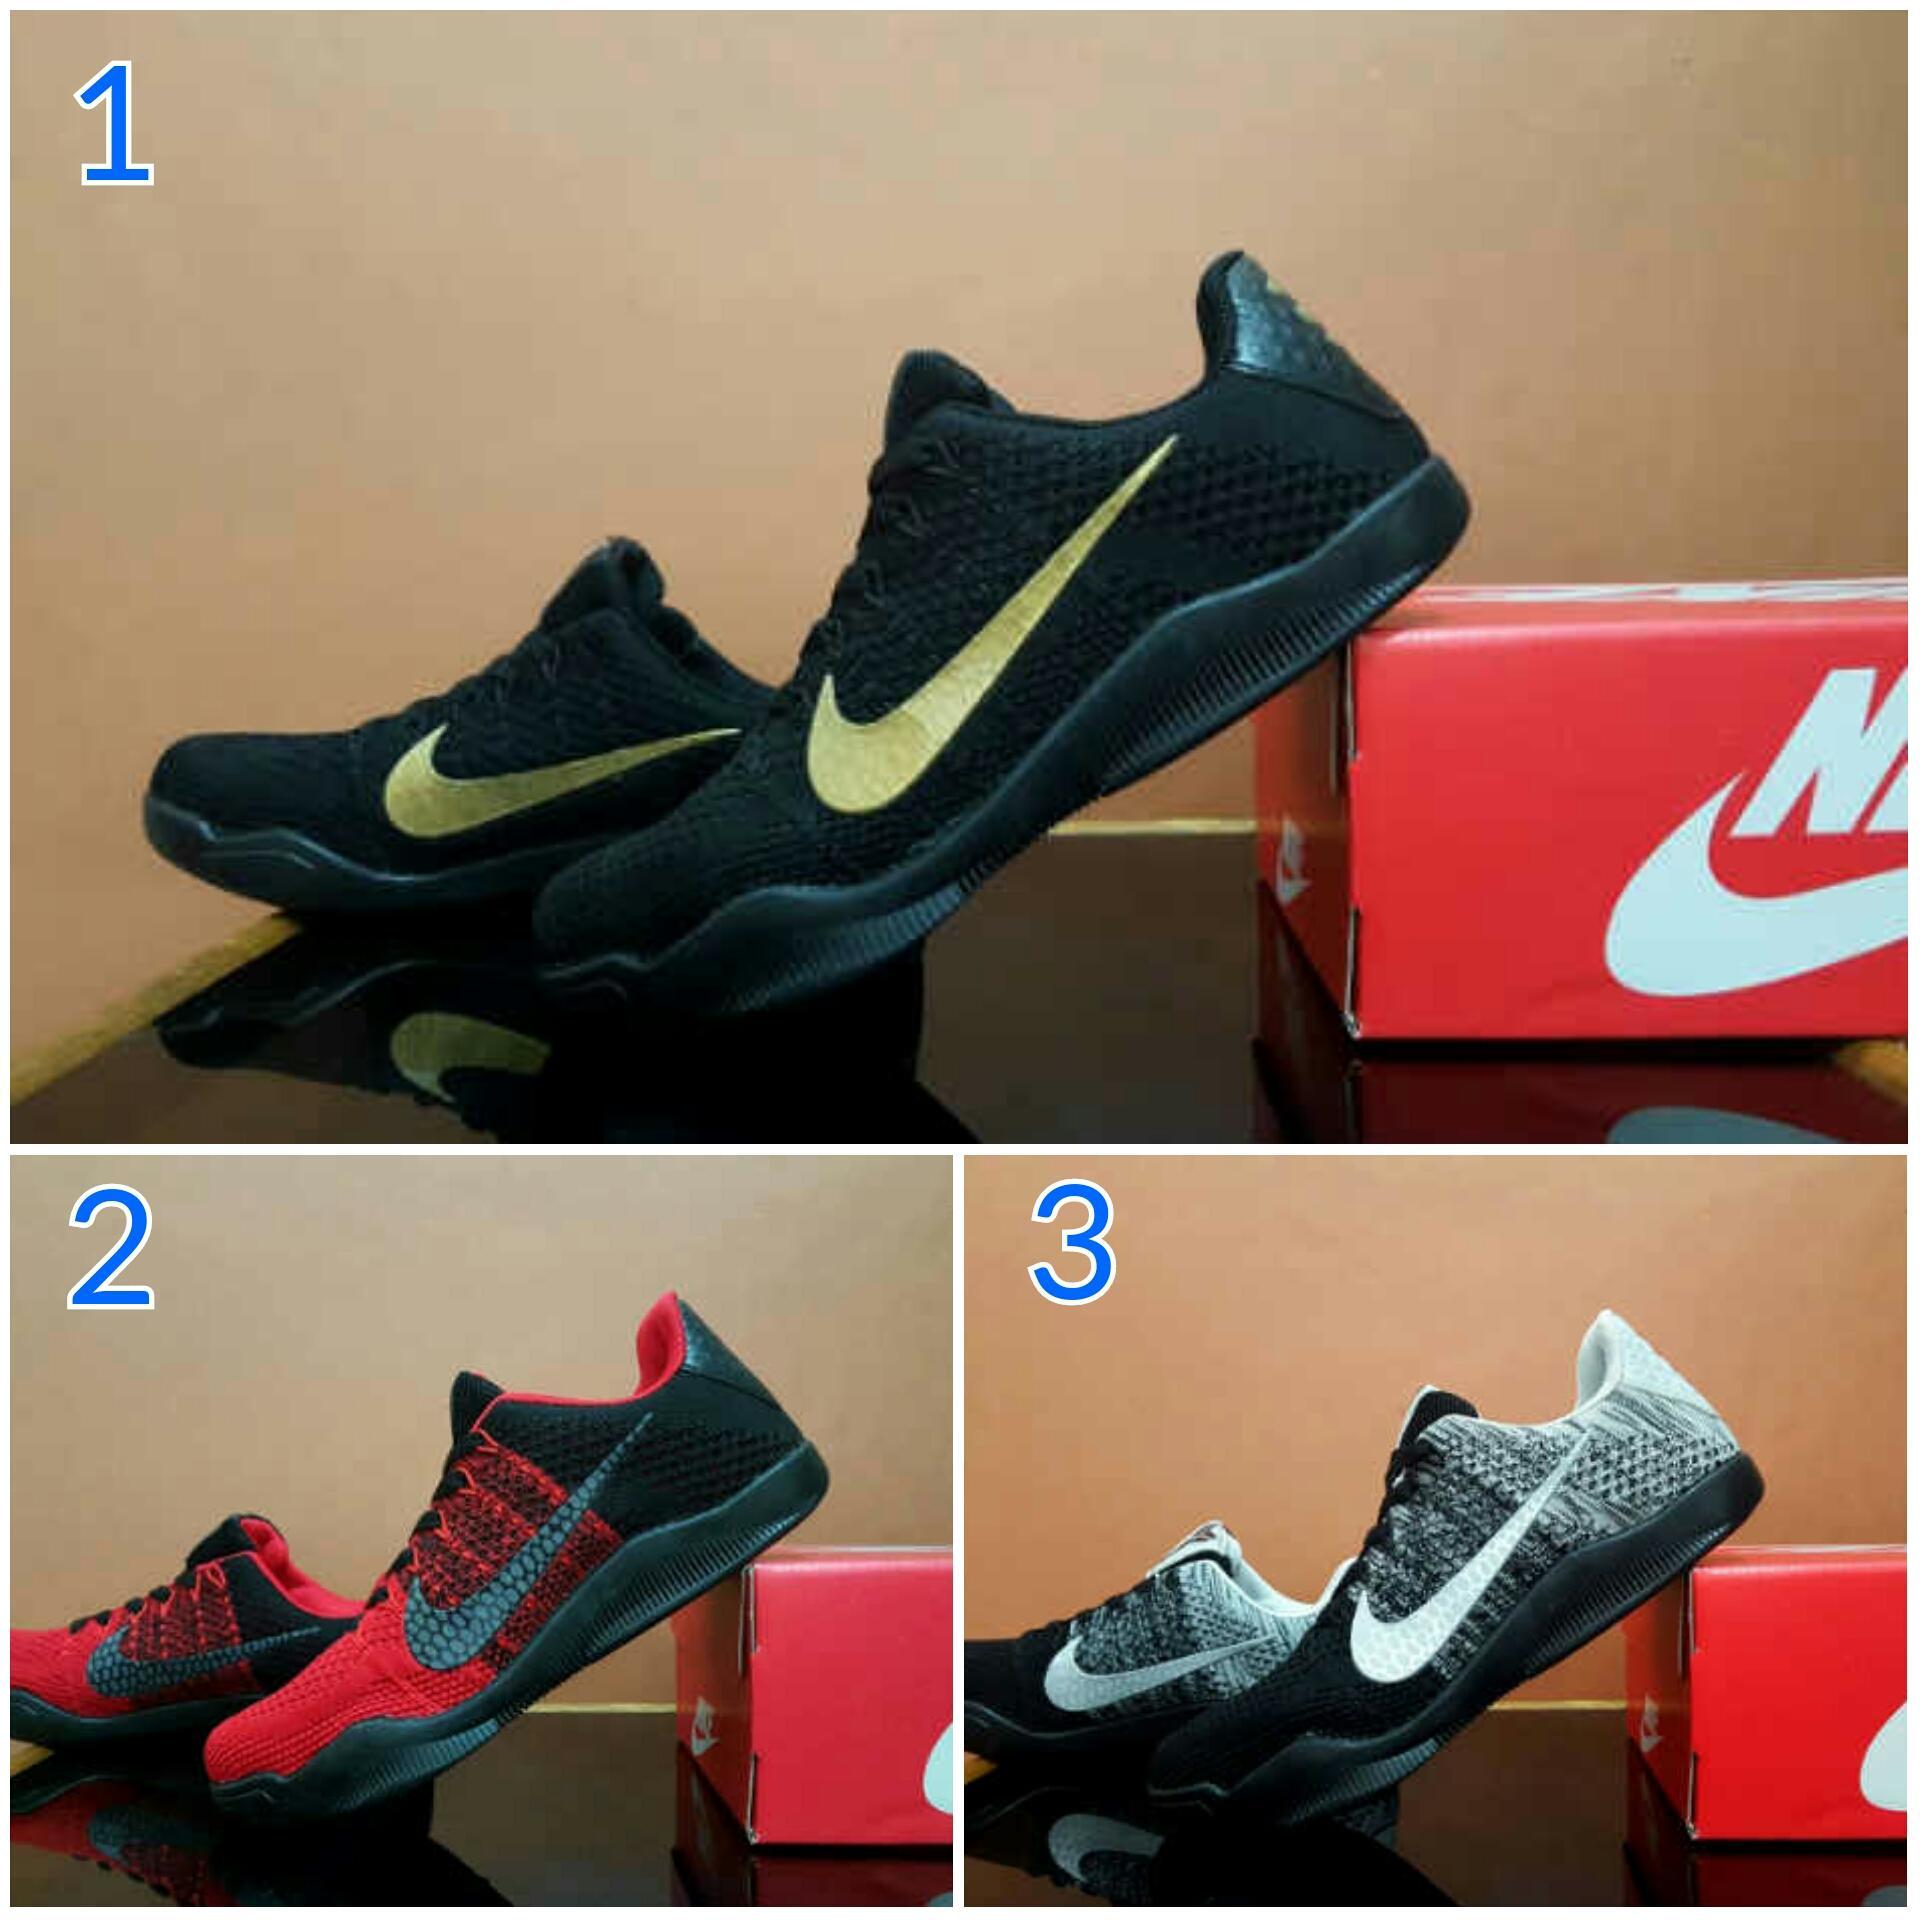 Promo Sepatu Pria Olahraga Fitnes Nike Kobe 11 Premium Made In Vietnam Murah Diskon